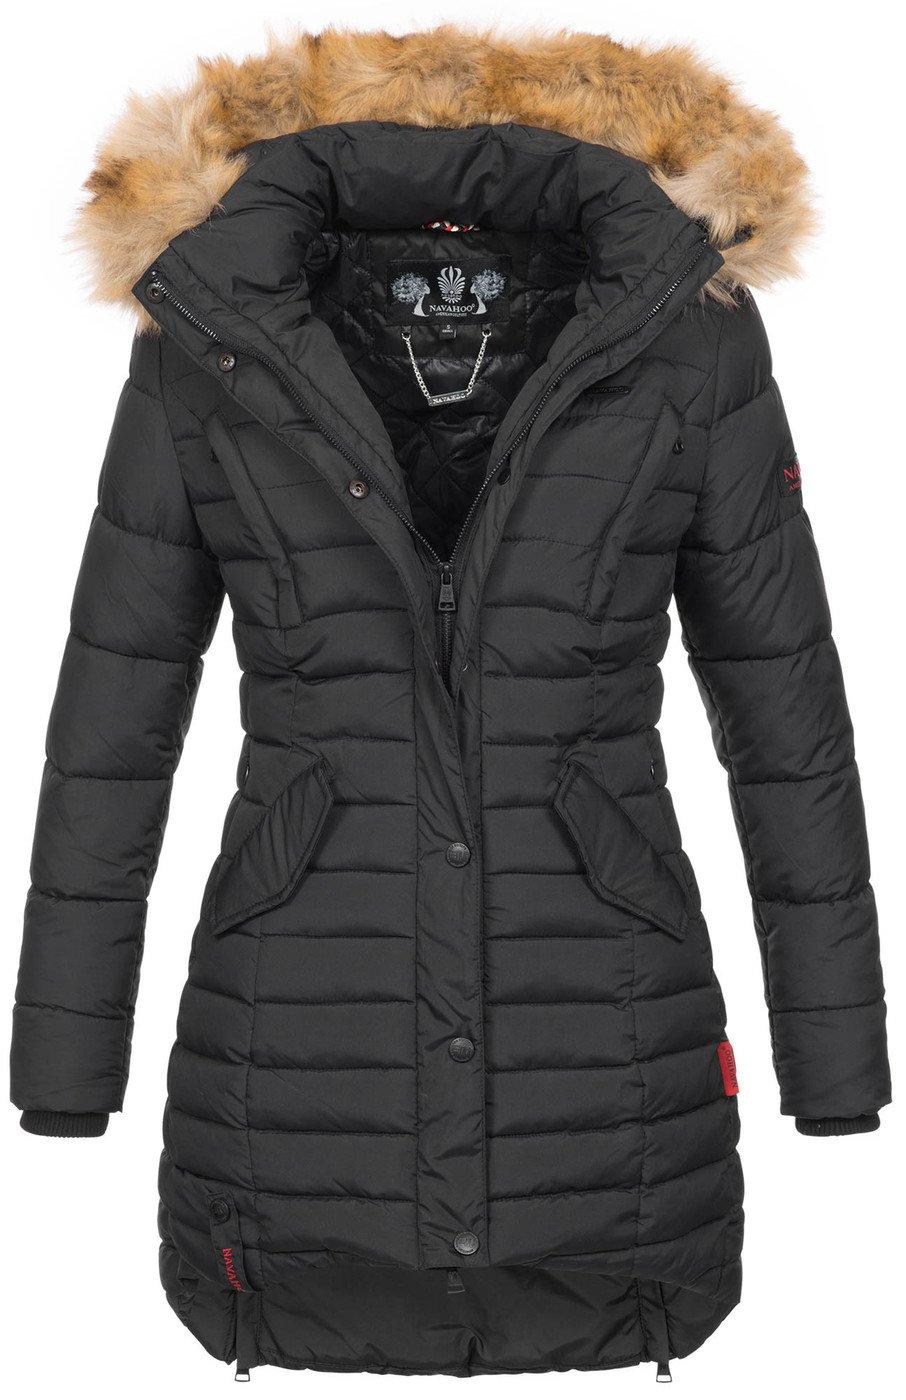 15fbaa40fc57b Navahoo Damen Winter Jacke Steppjacke Mantel Parka warm gefüttert gesteppt  B640